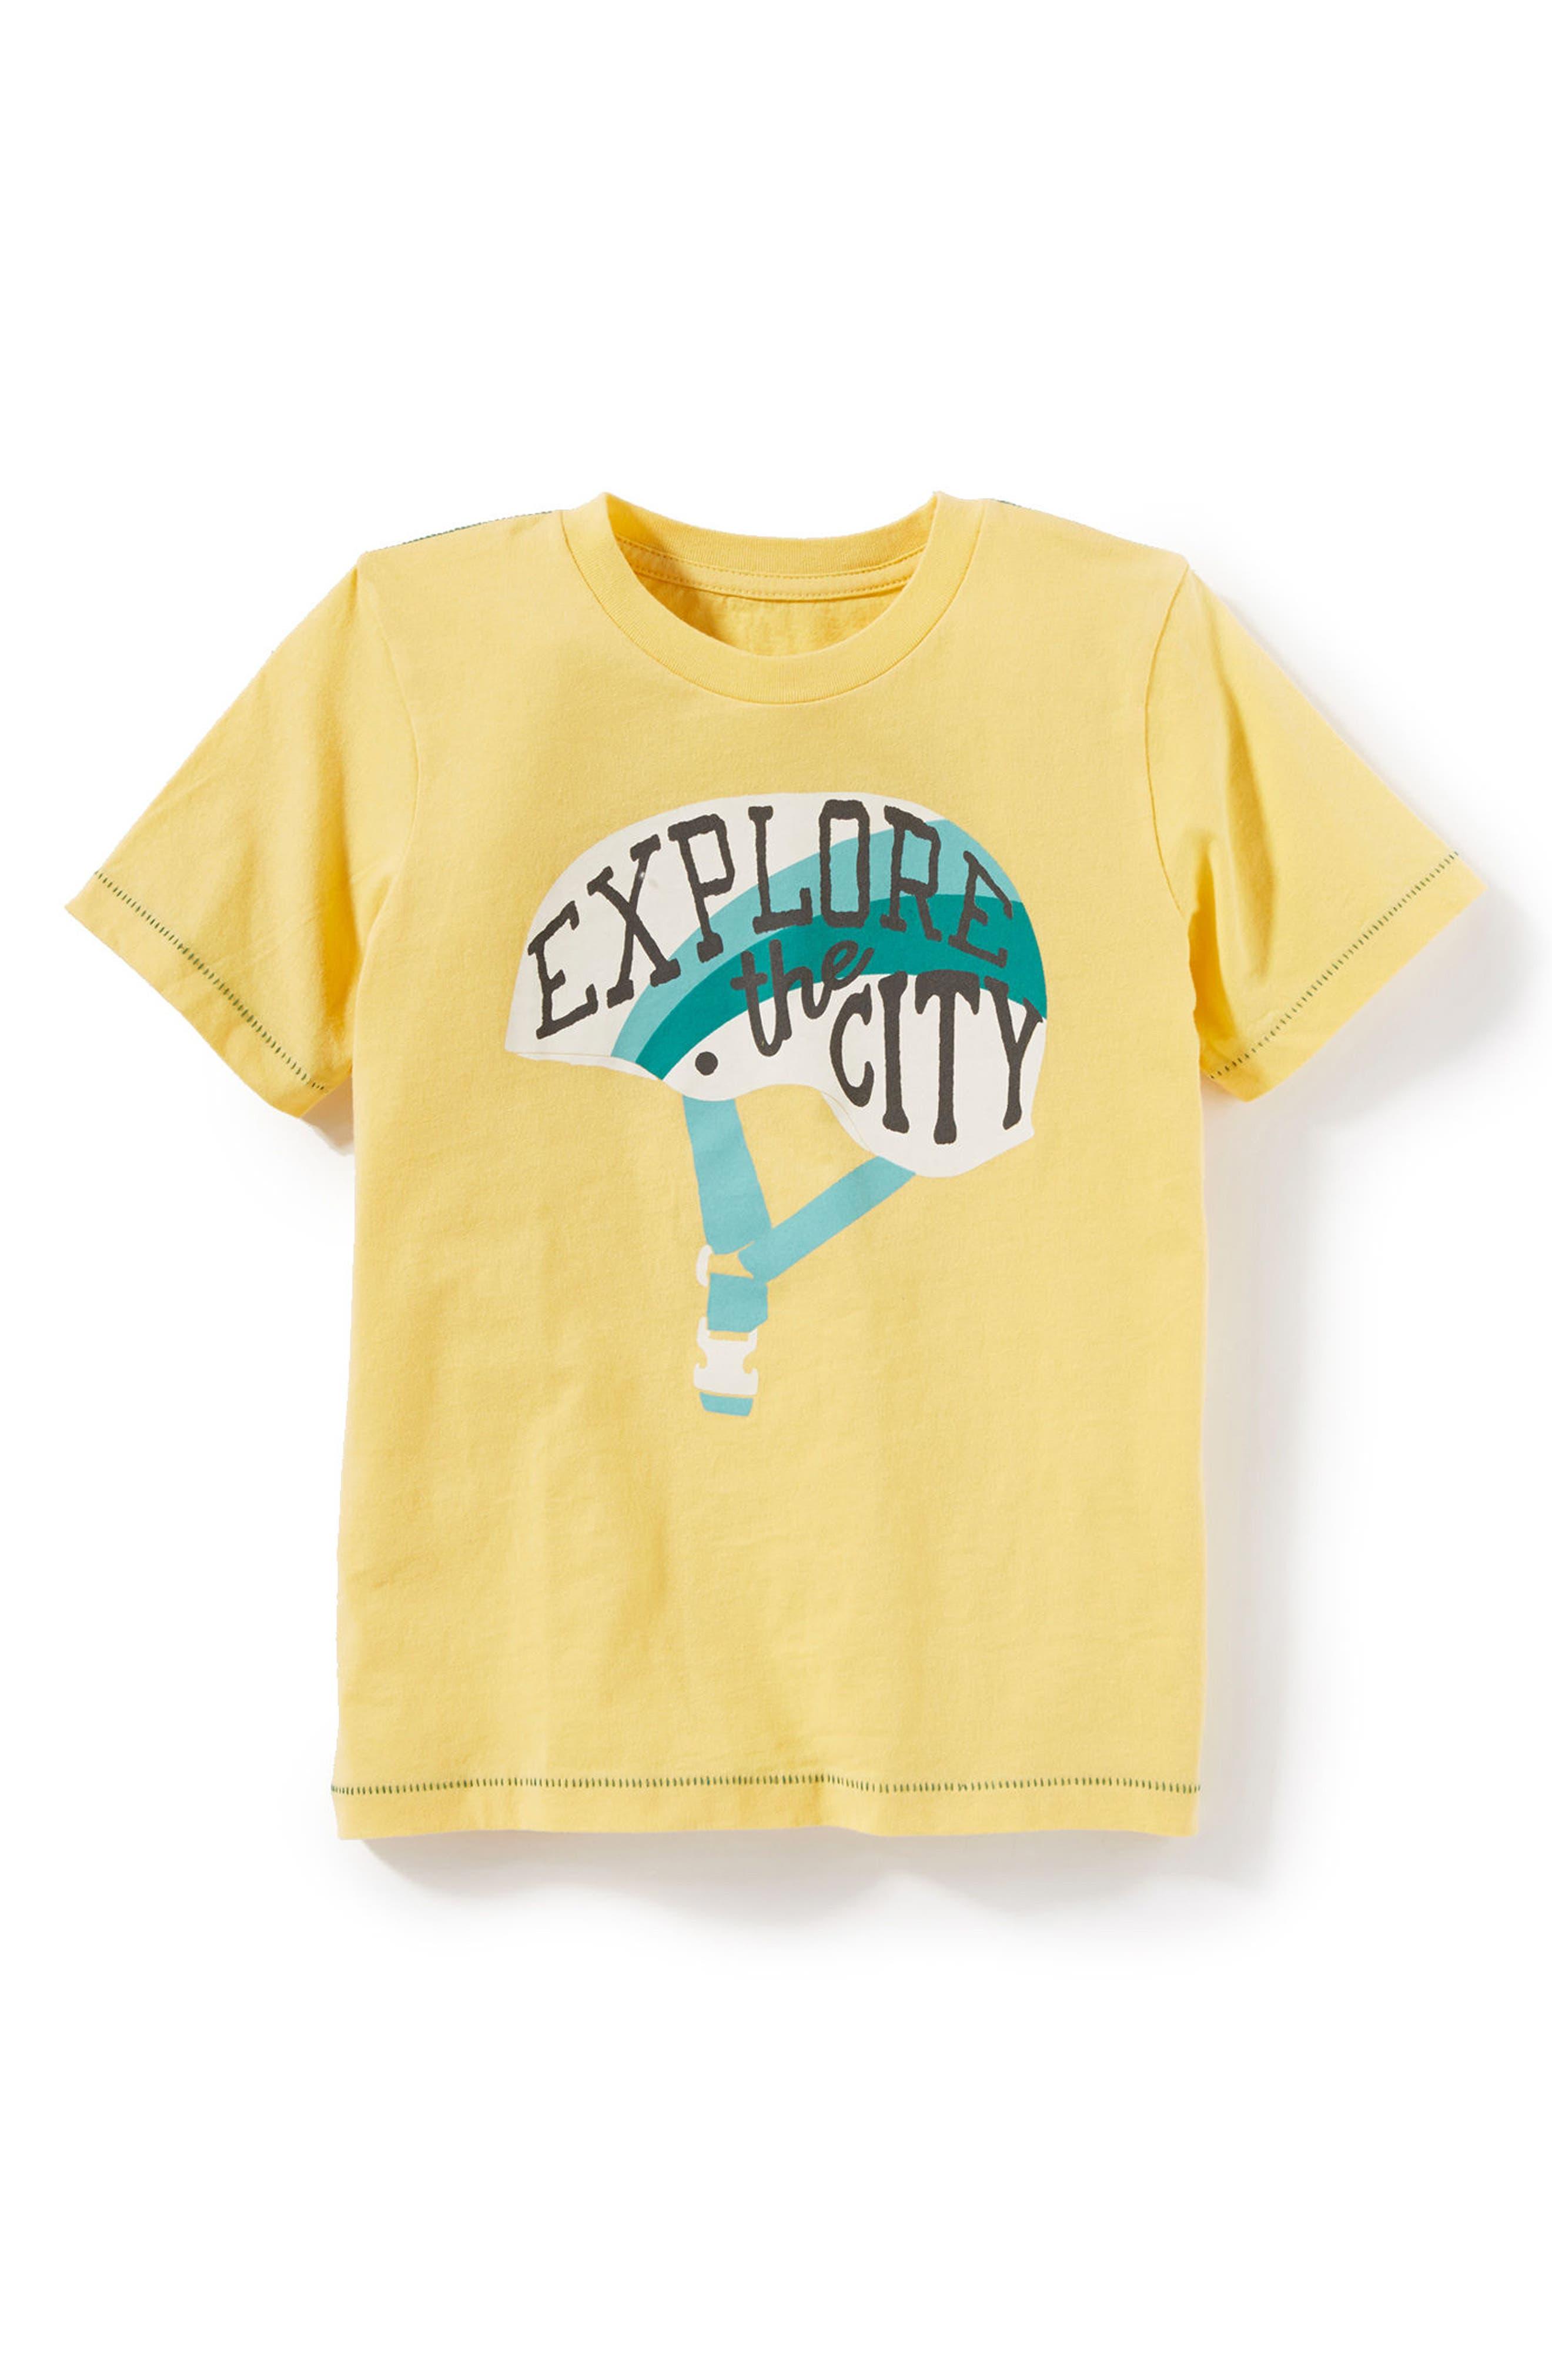 Explore the City Graphic T-Shirt,                             Main thumbnail 1, color,                             700